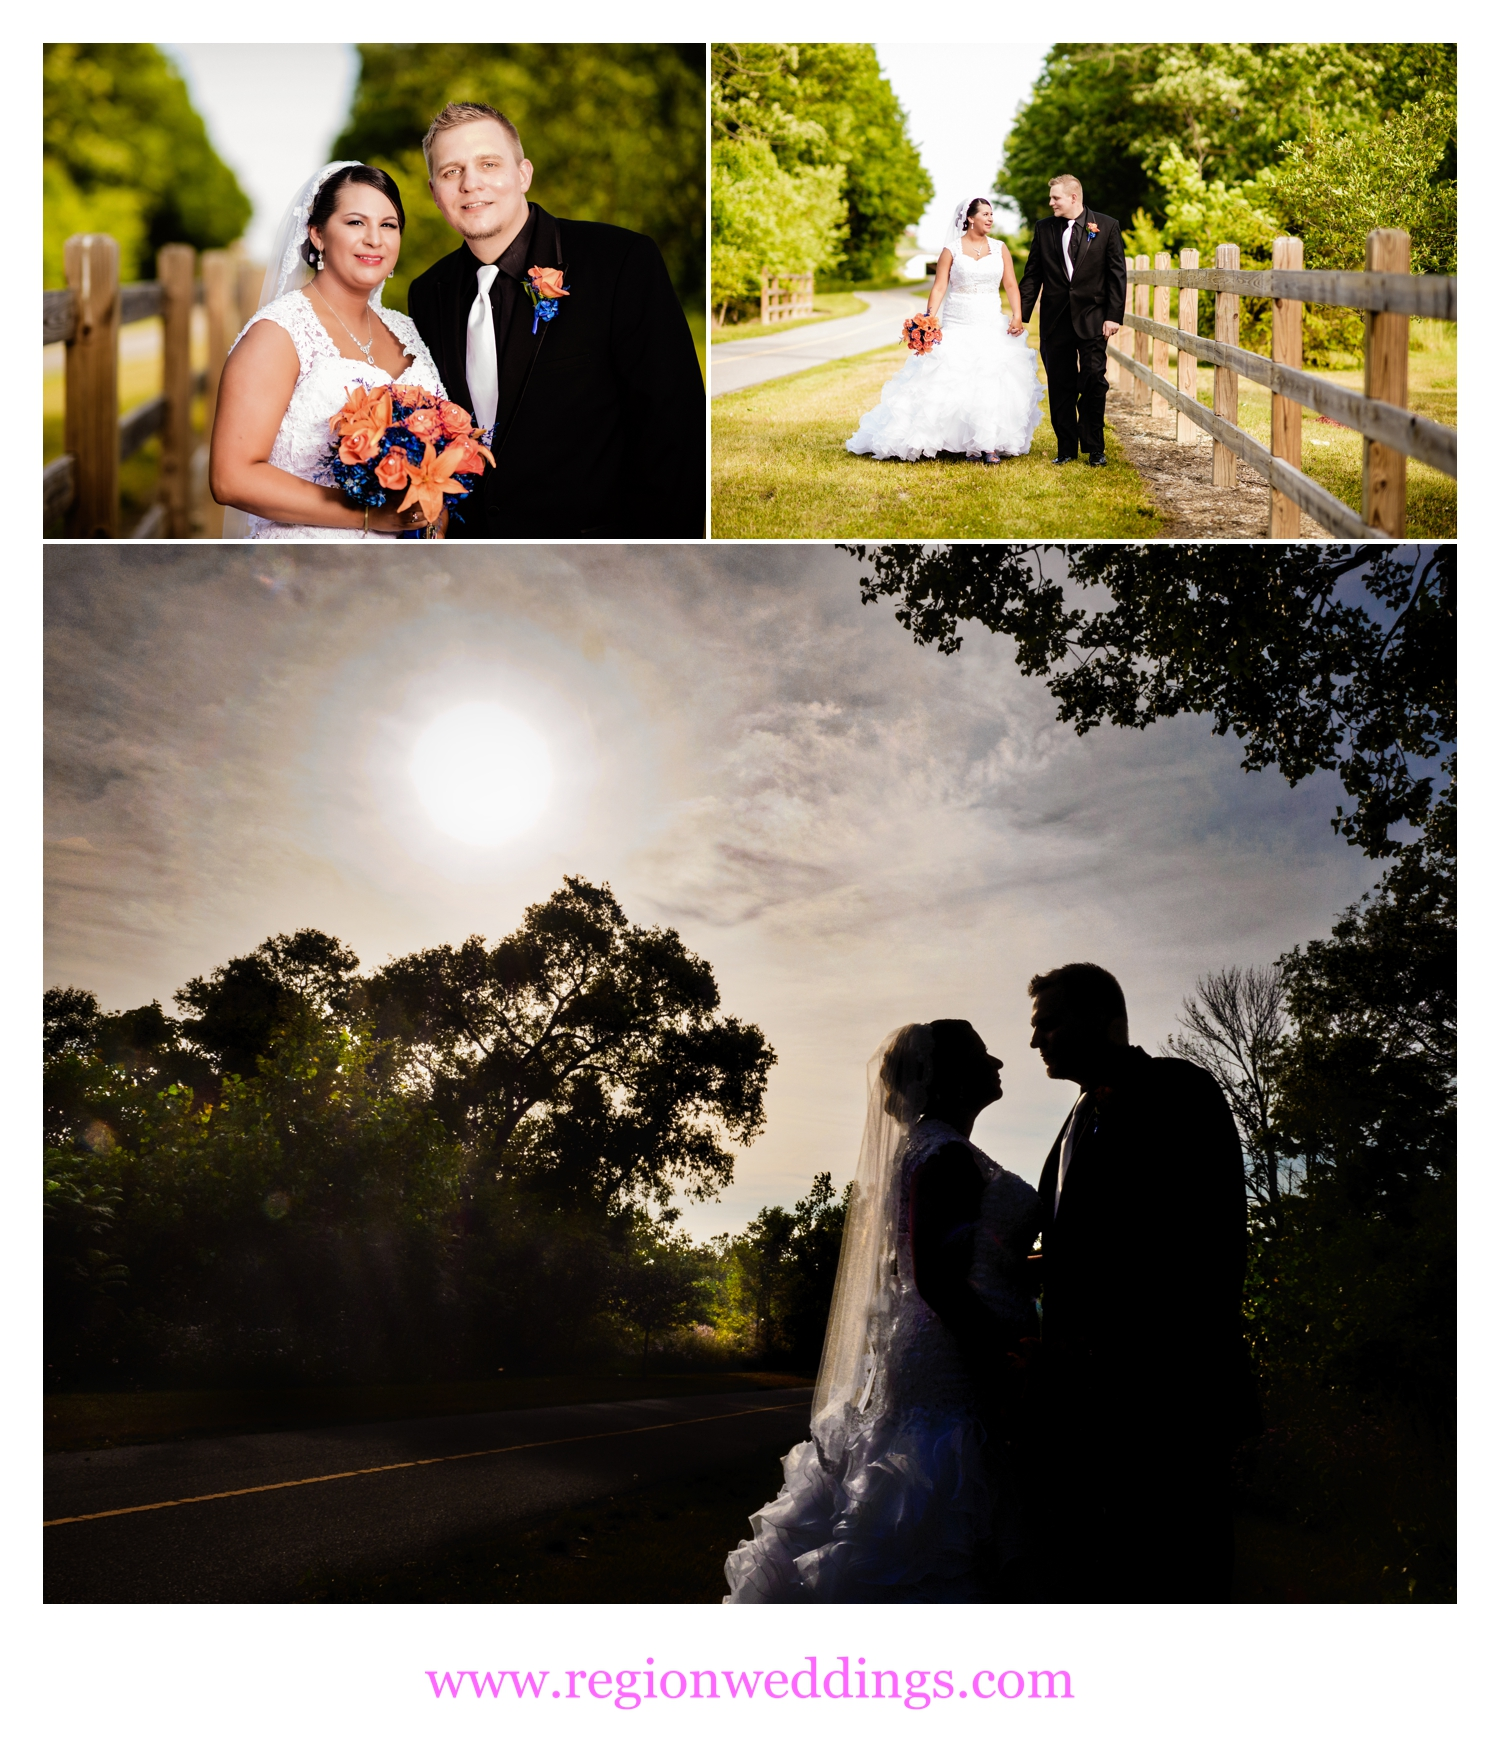 Romantic bride and groom summer wedding photos.